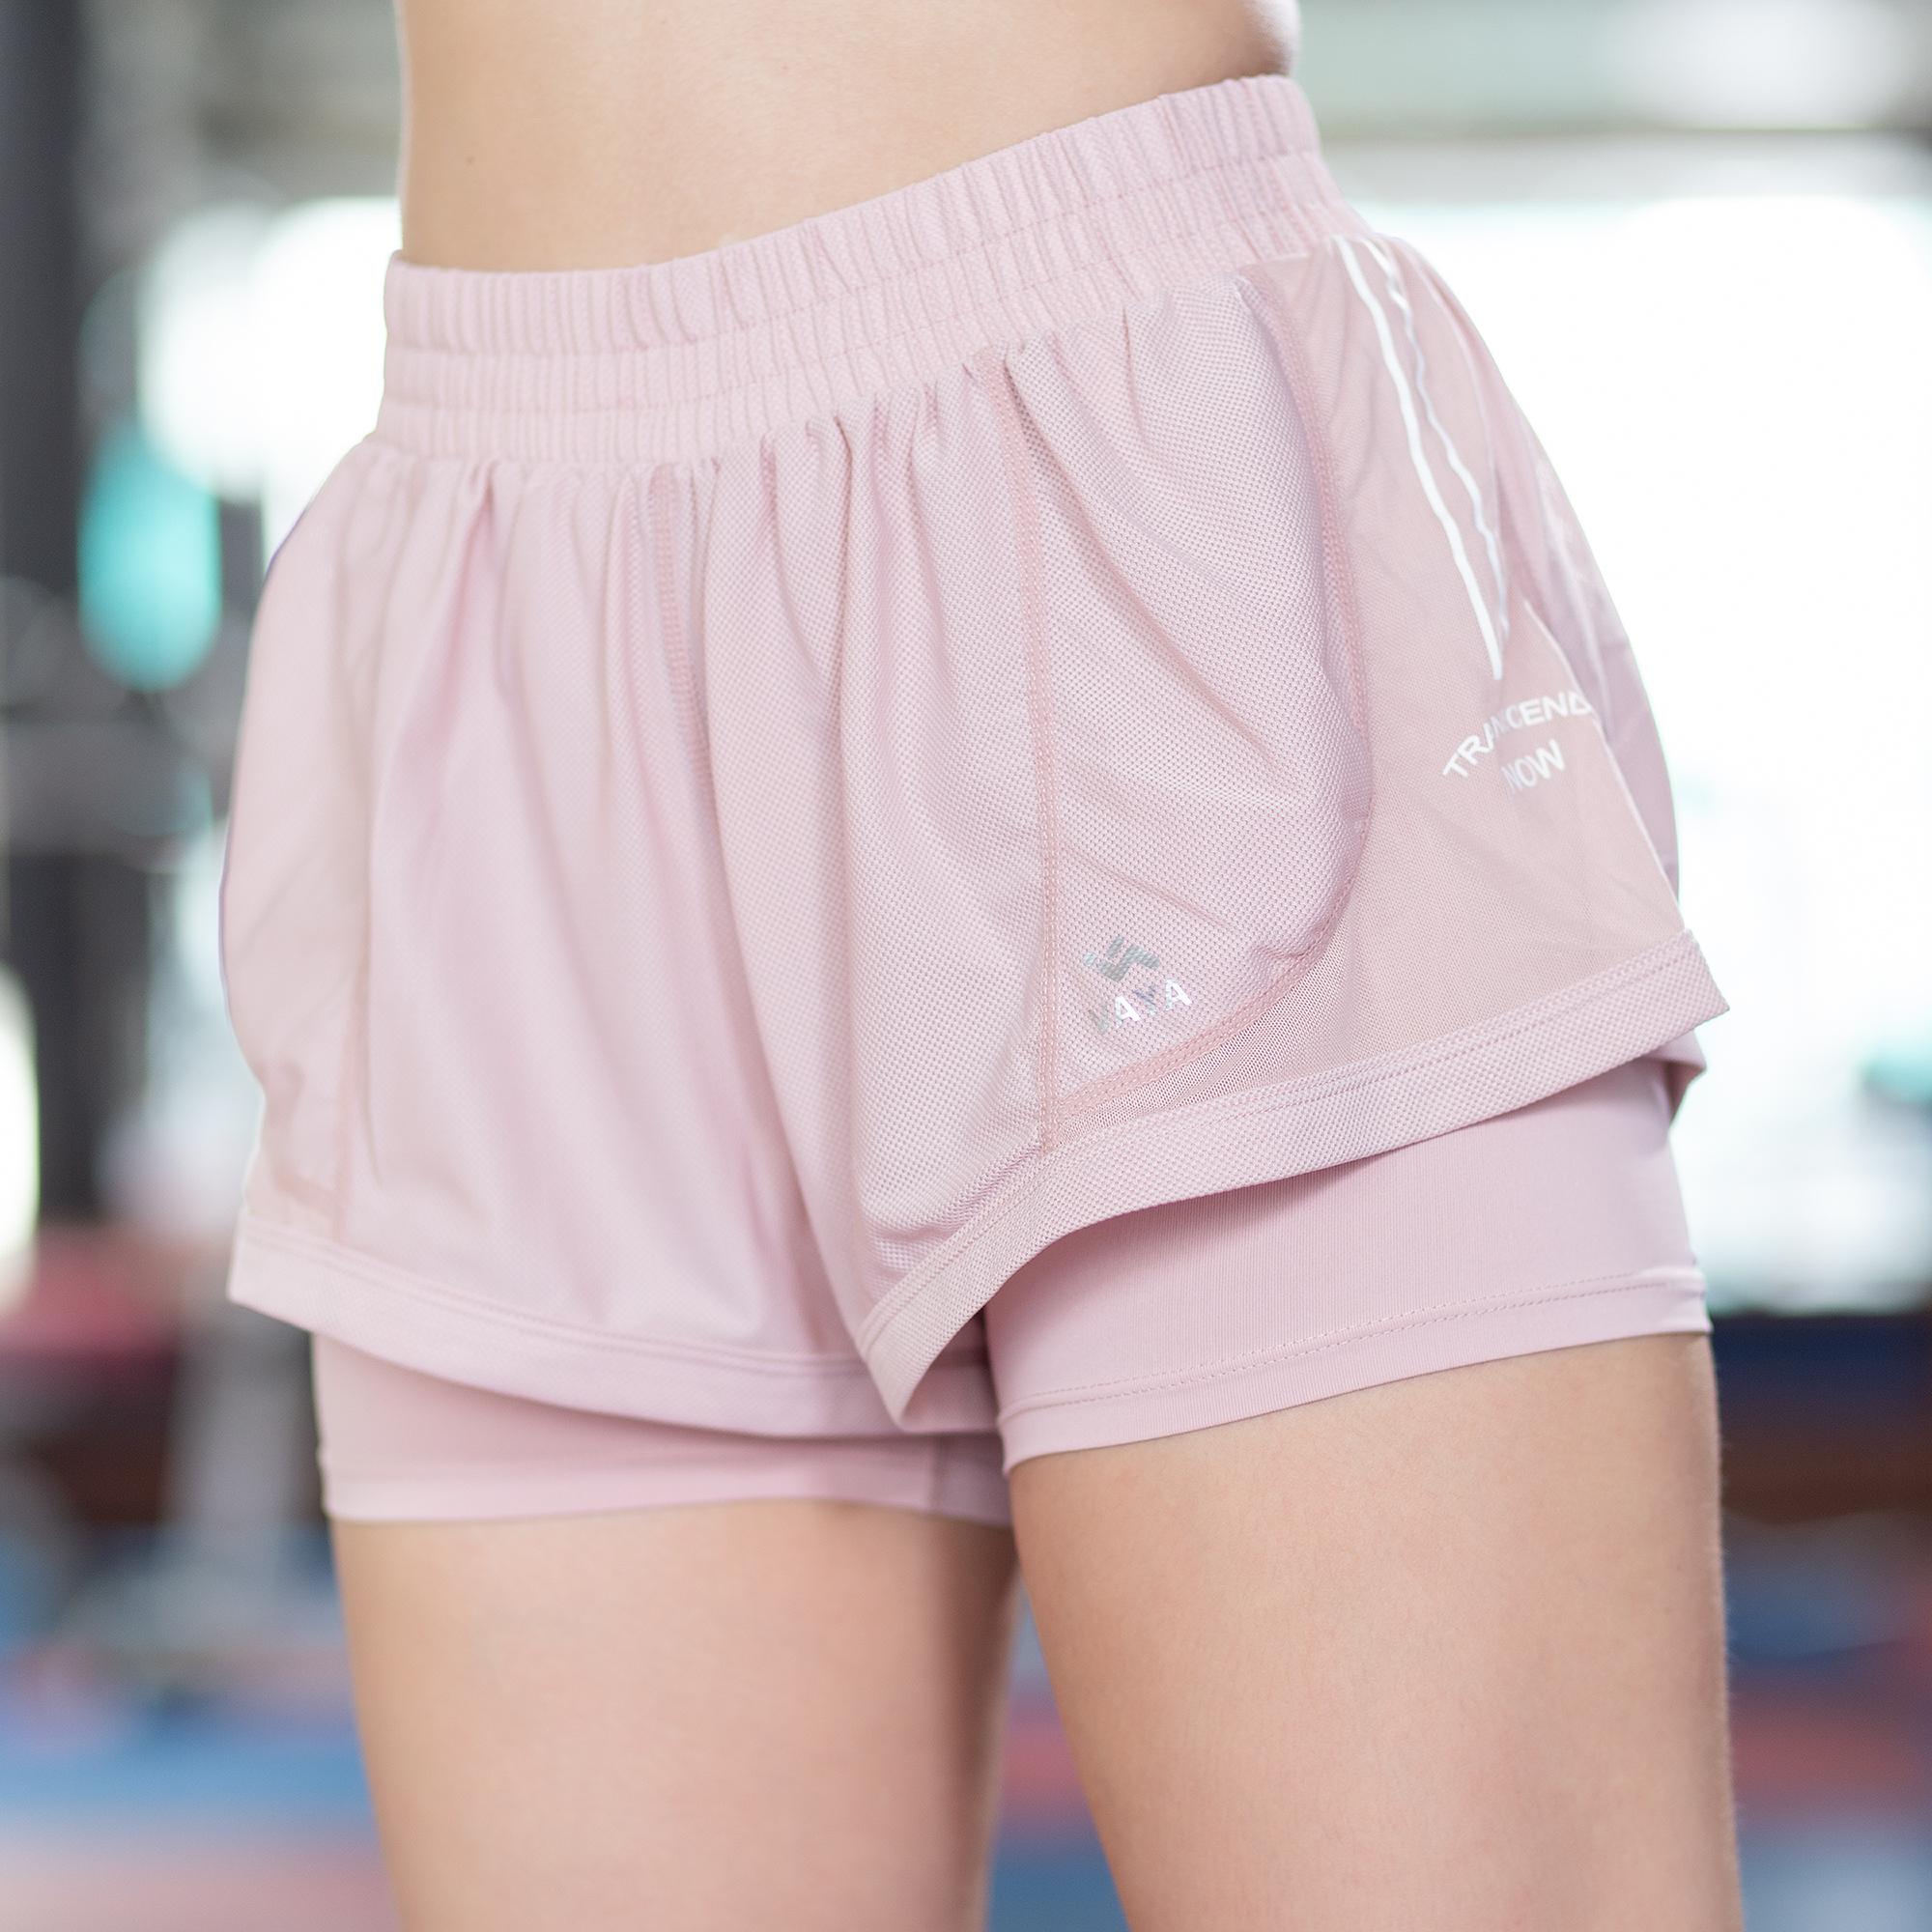 Light Pink Sports Shorts กางเกงขาสั้นสุดน่ารัก